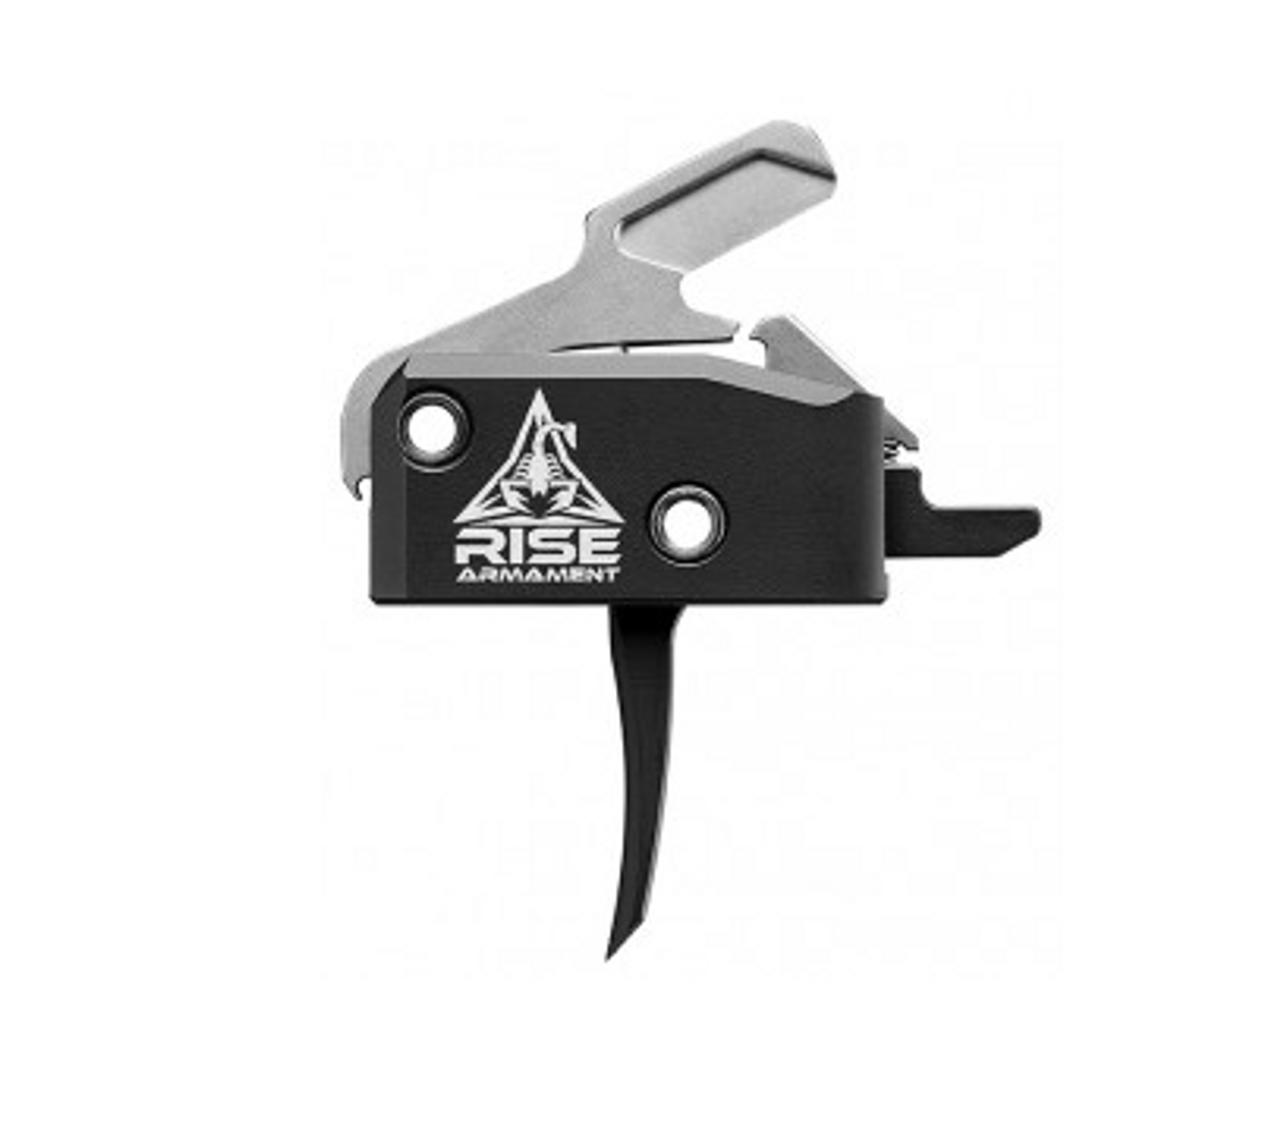 RA-434 High Performance Trigger